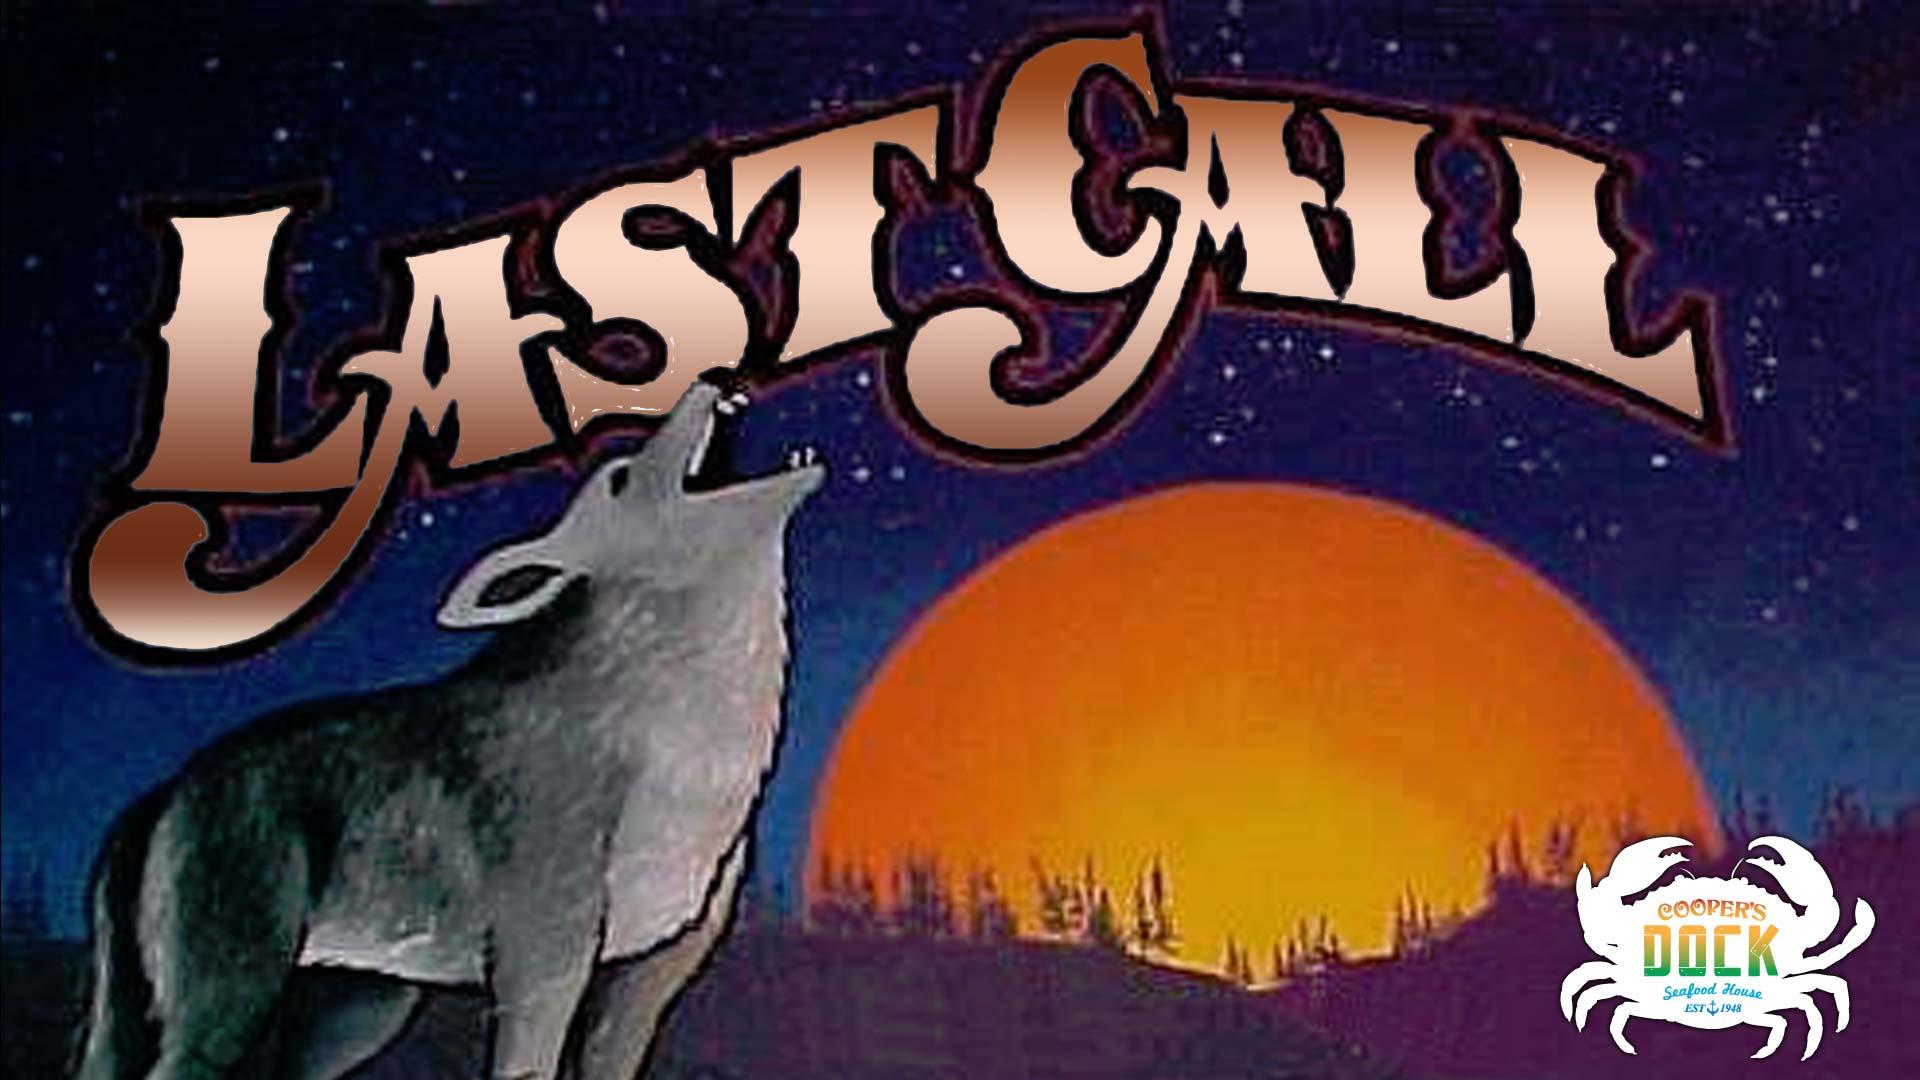 Last Call Live Band